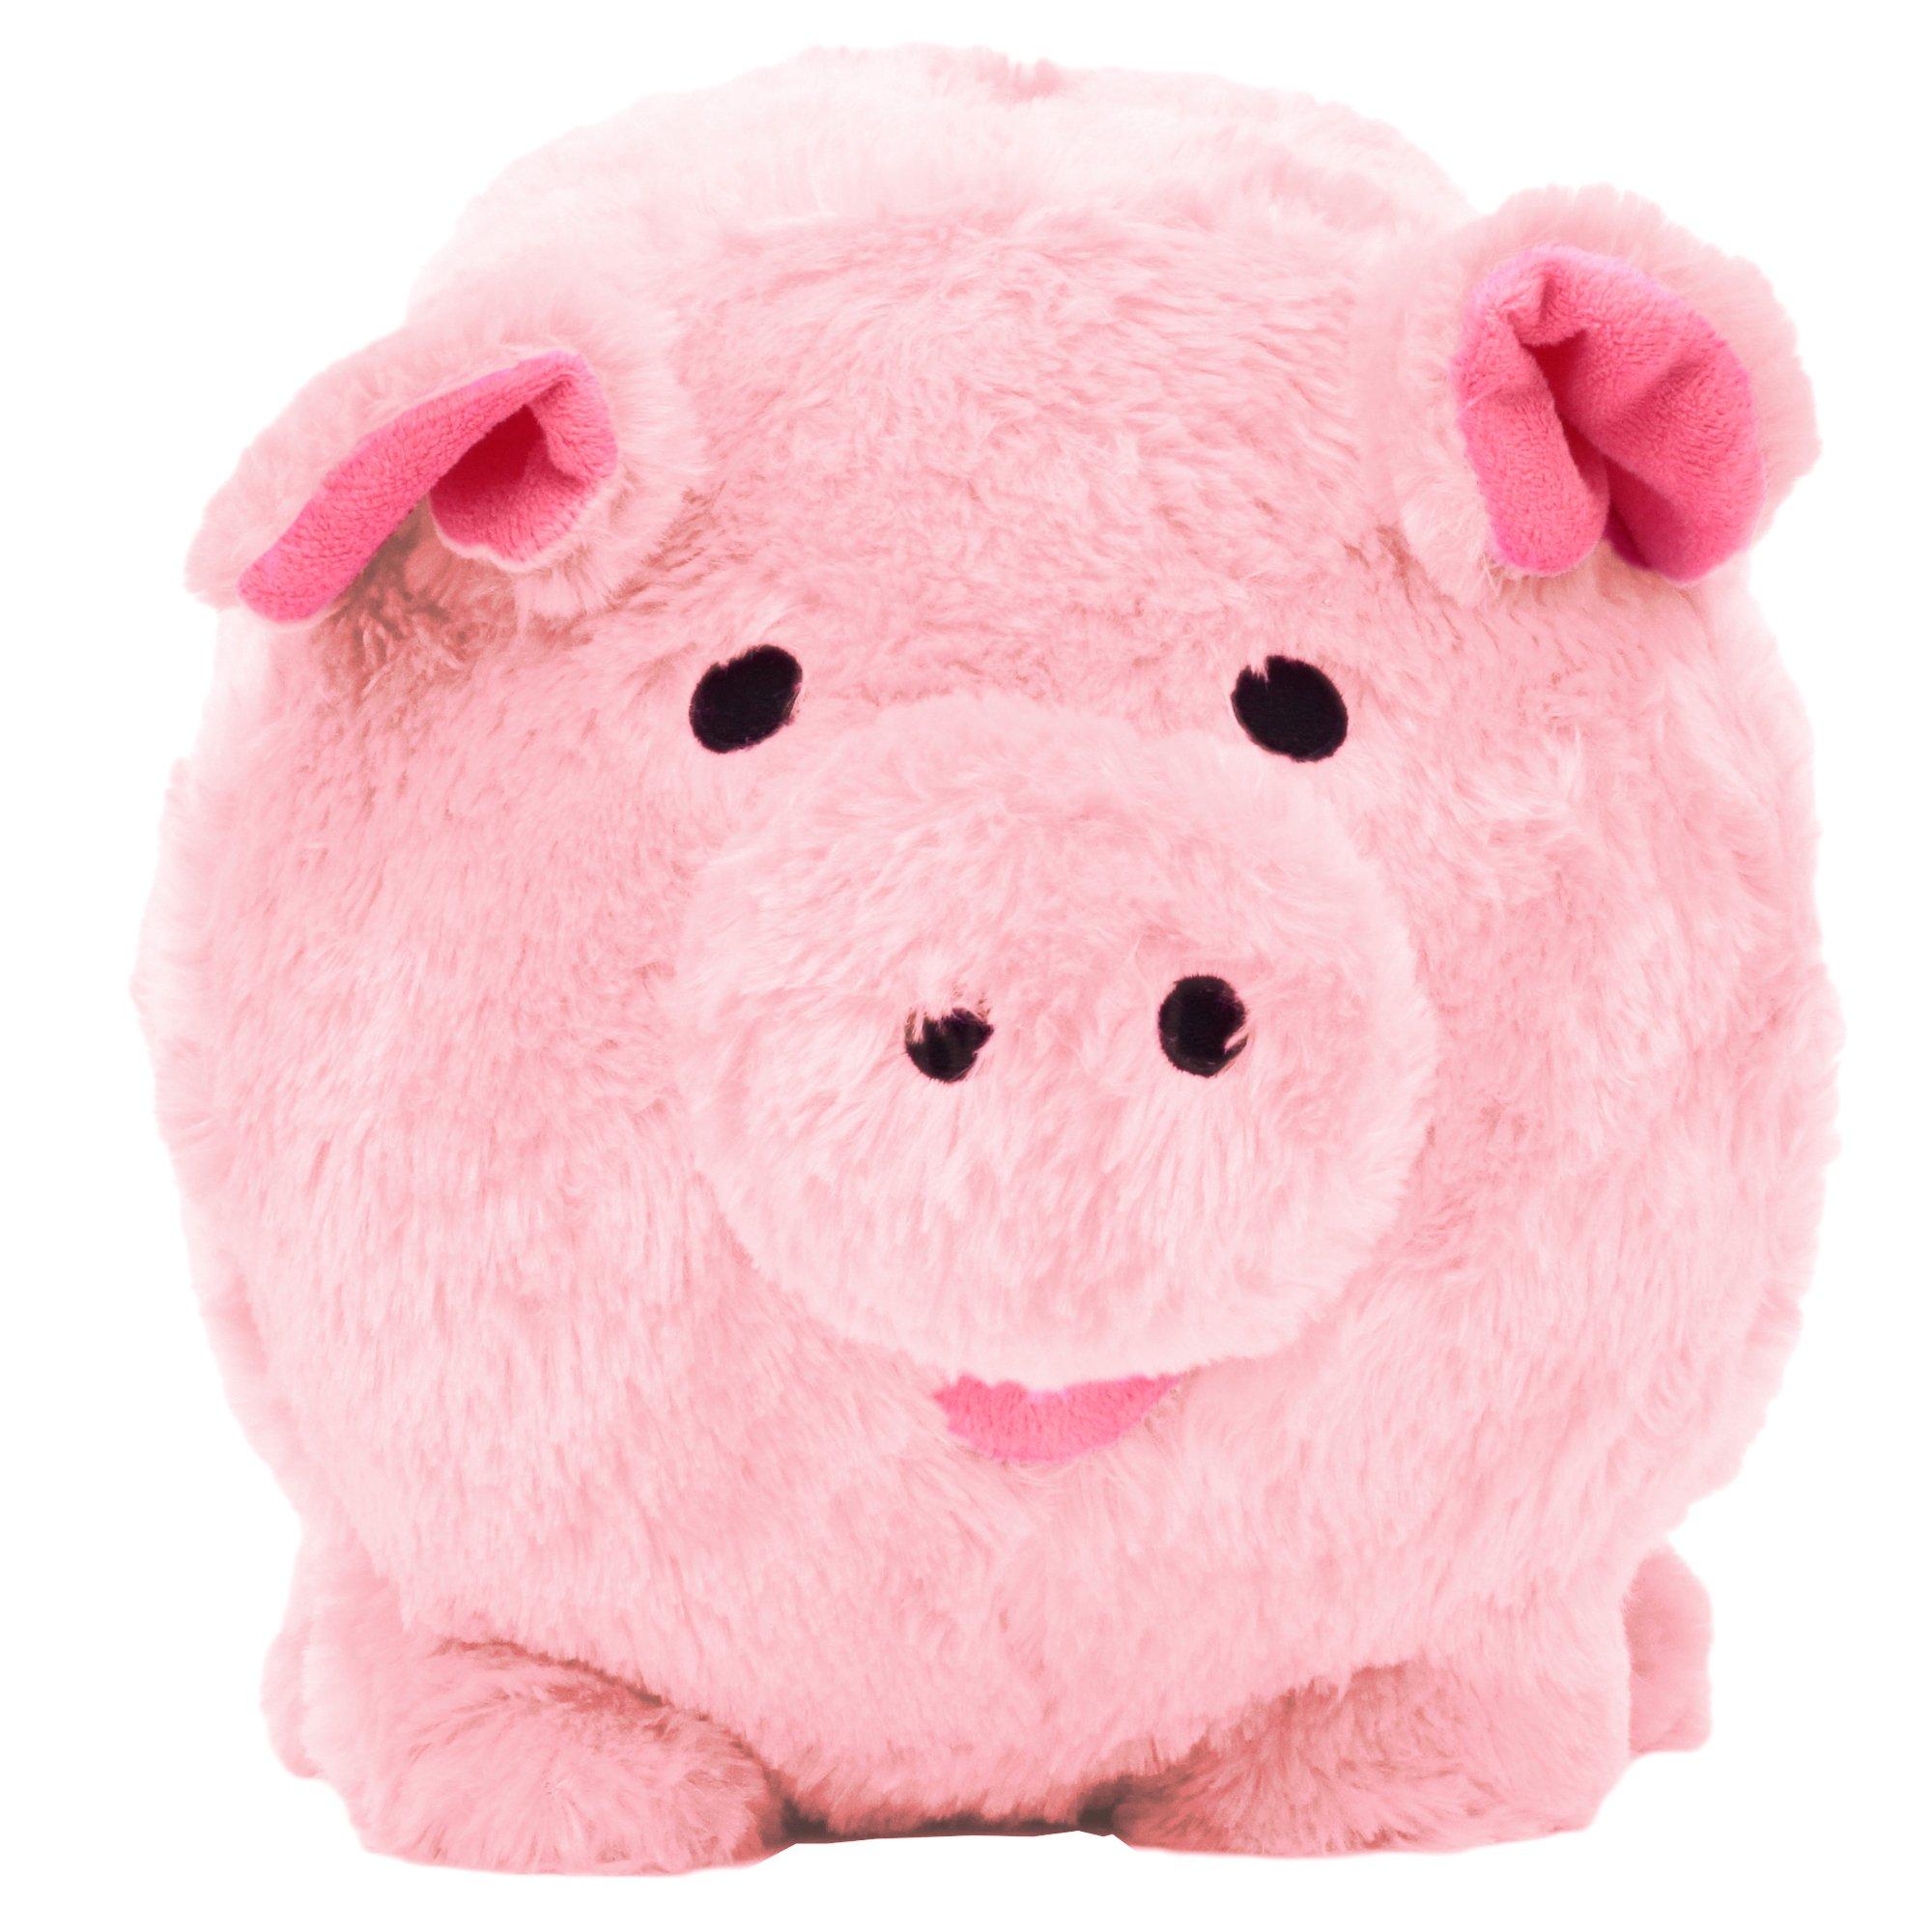 Oversized Pink Plush Piggy Bank